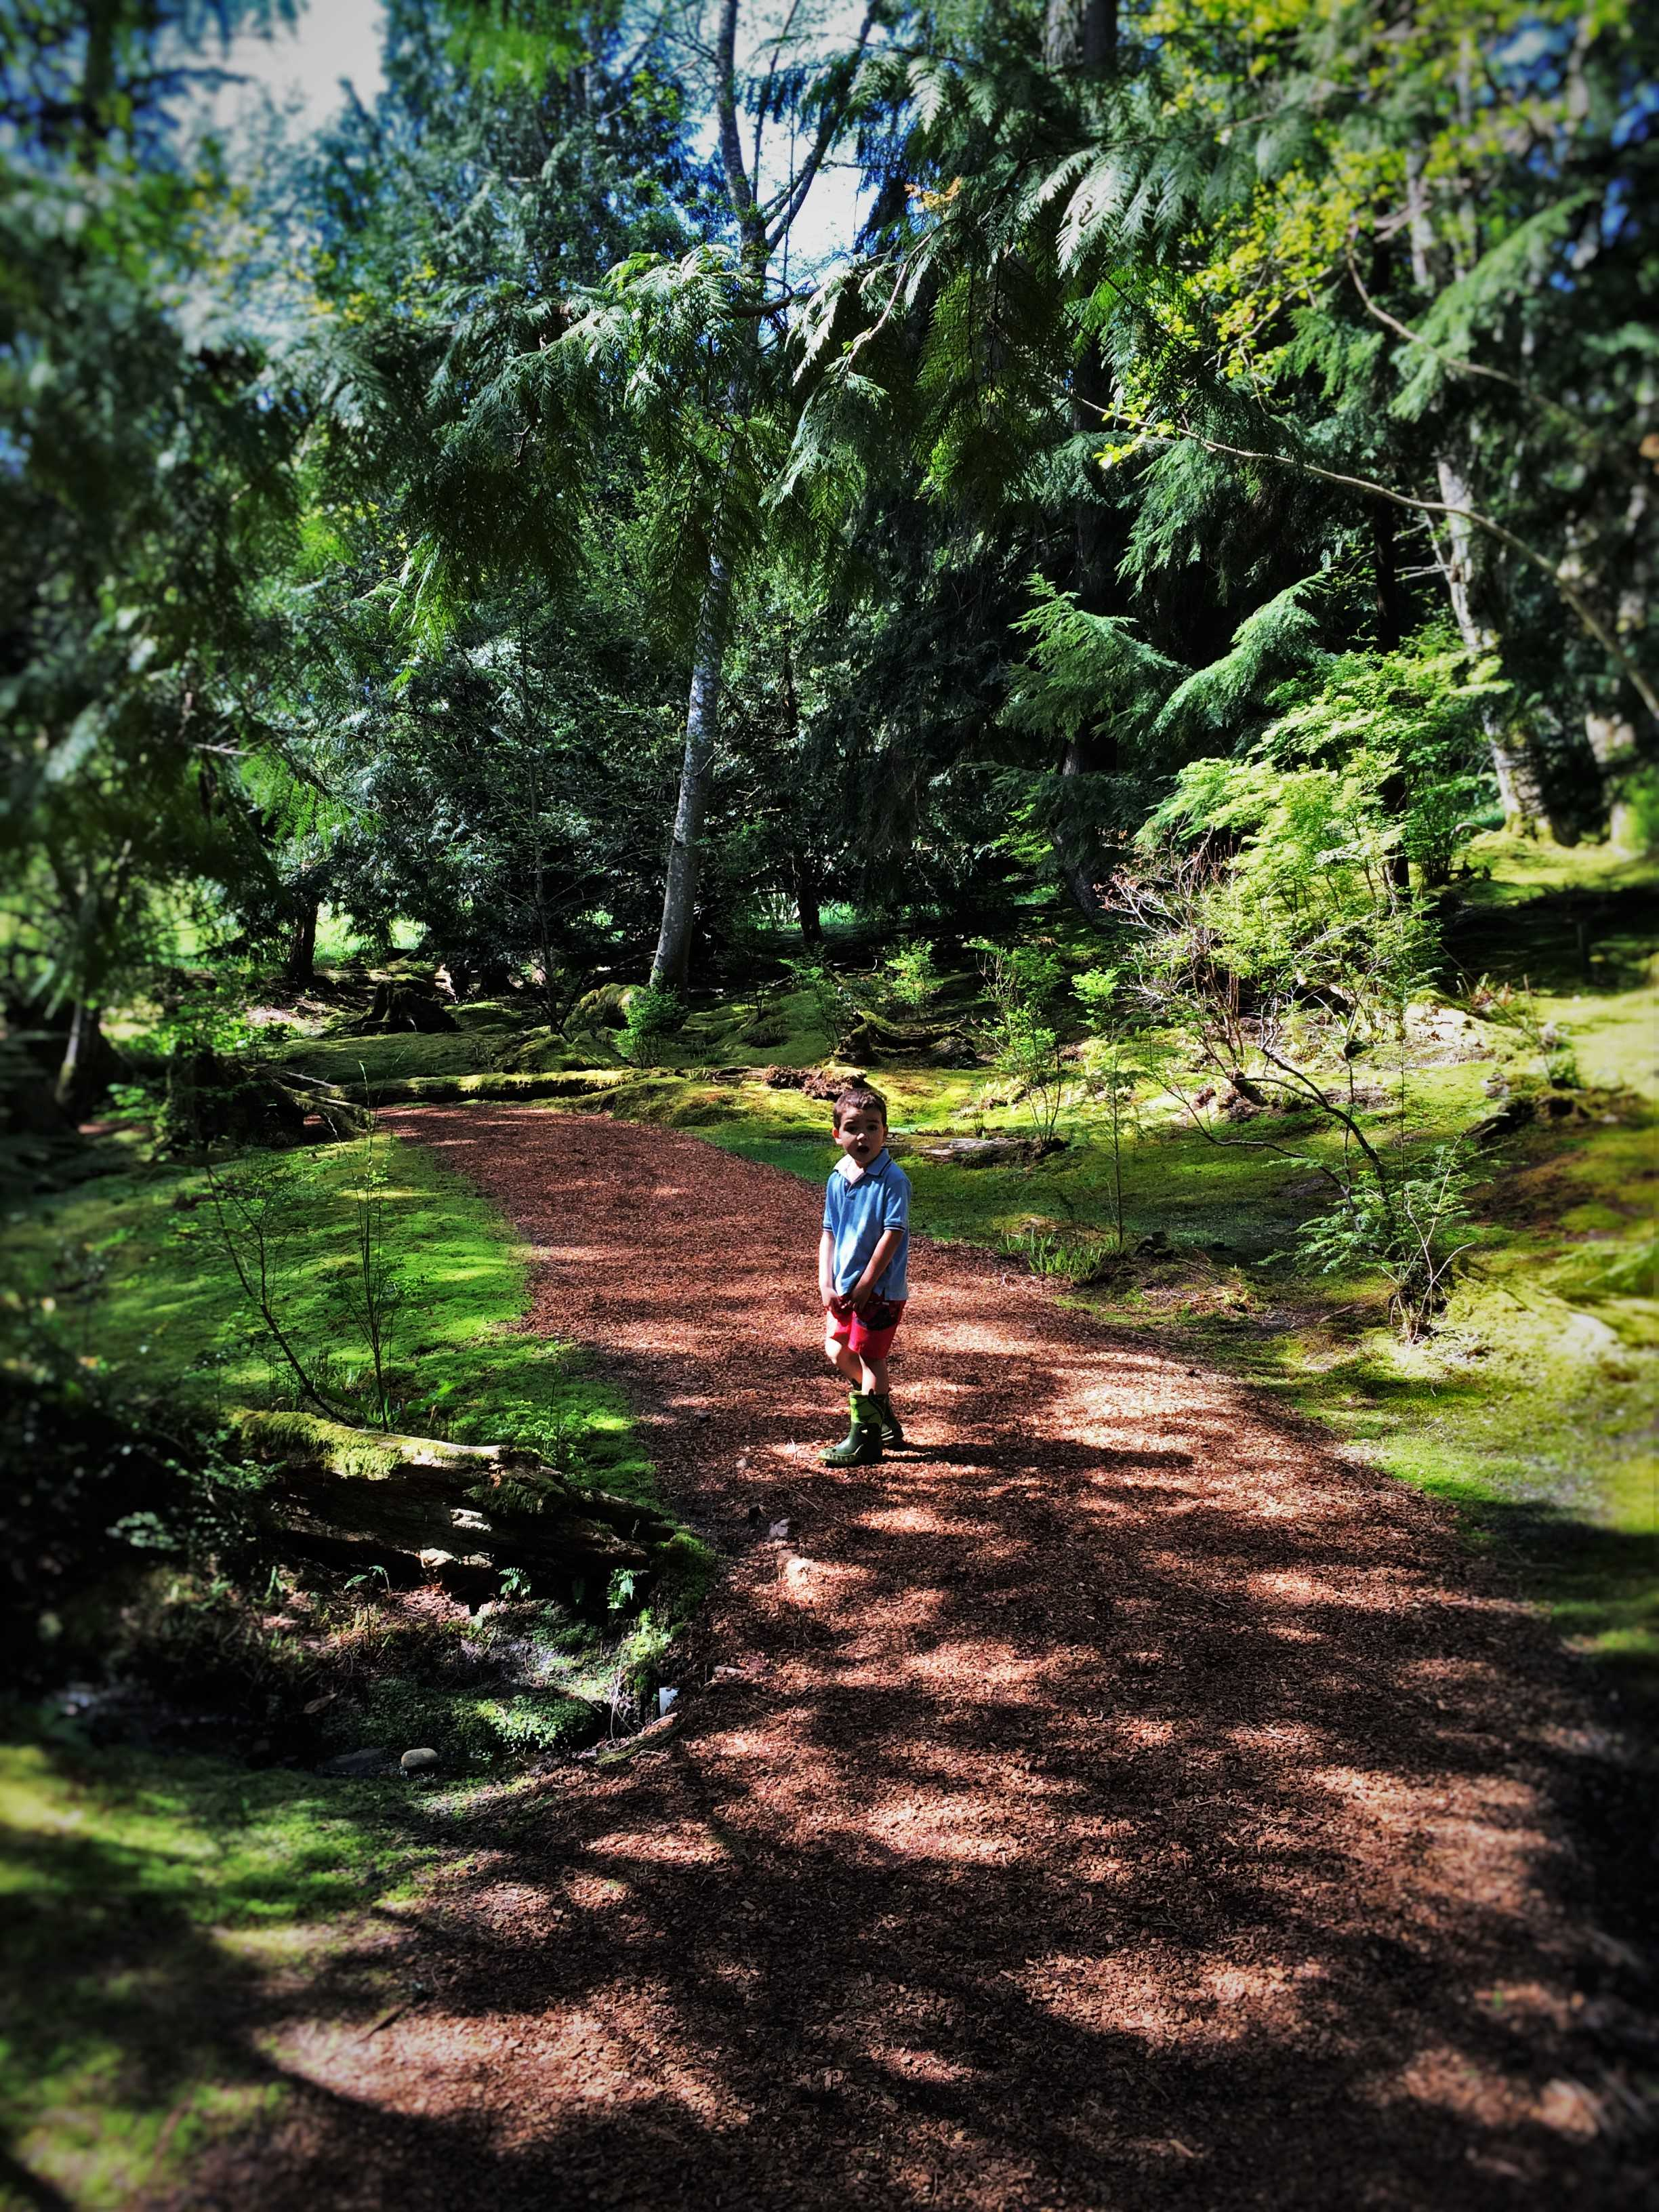 LittleMan on Shadowy Path at Bloedel Reserve Bainbridge Island 2